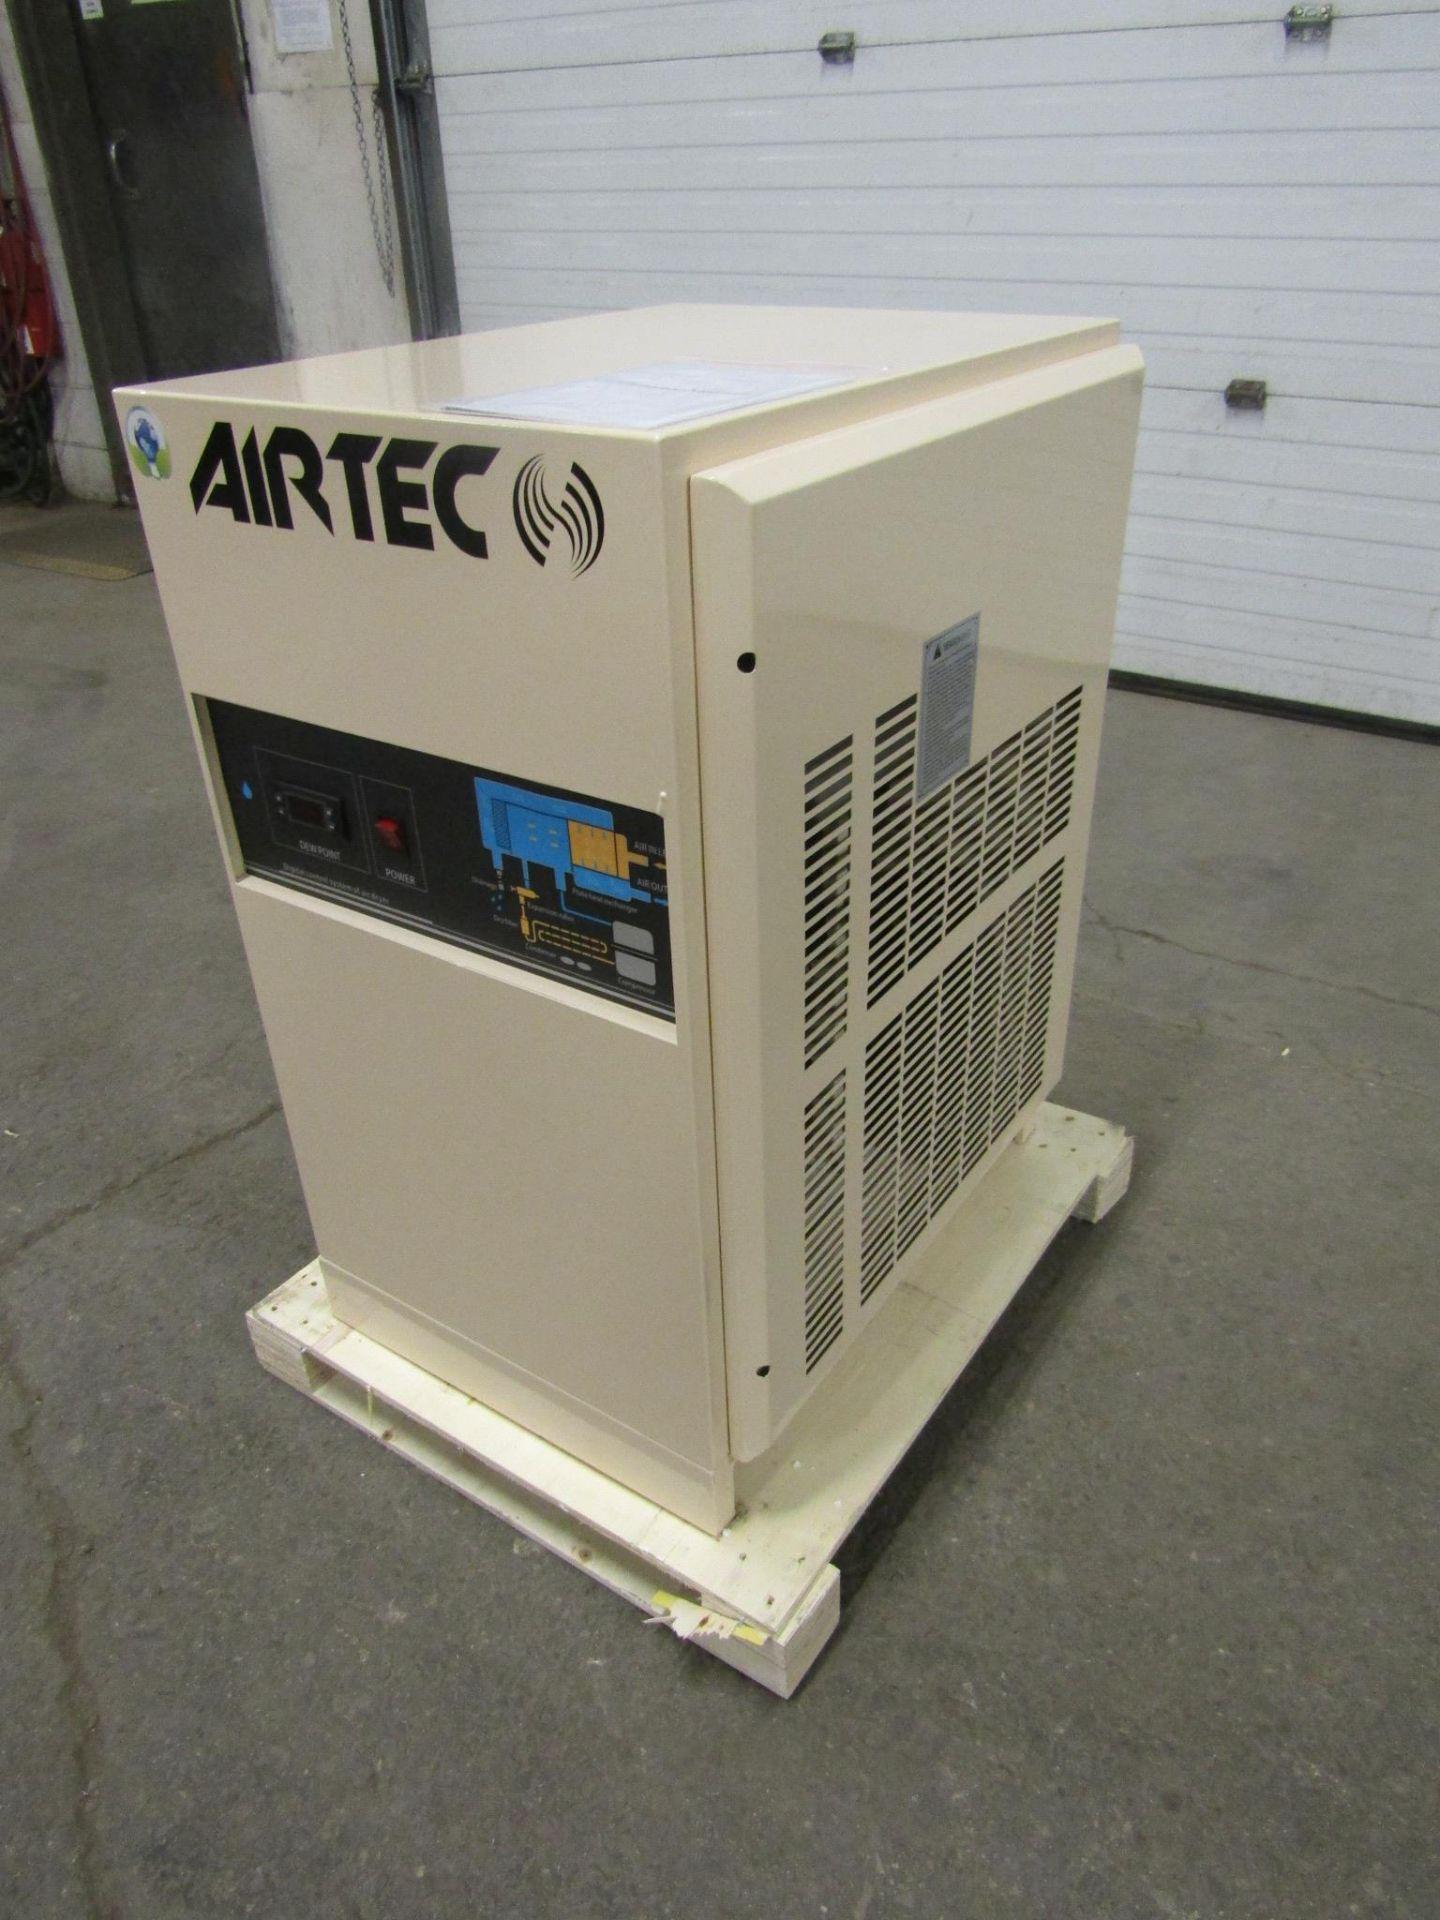 MINT Airtec Compressed Air Dryer 177 CFM - 20HP Unused new unit